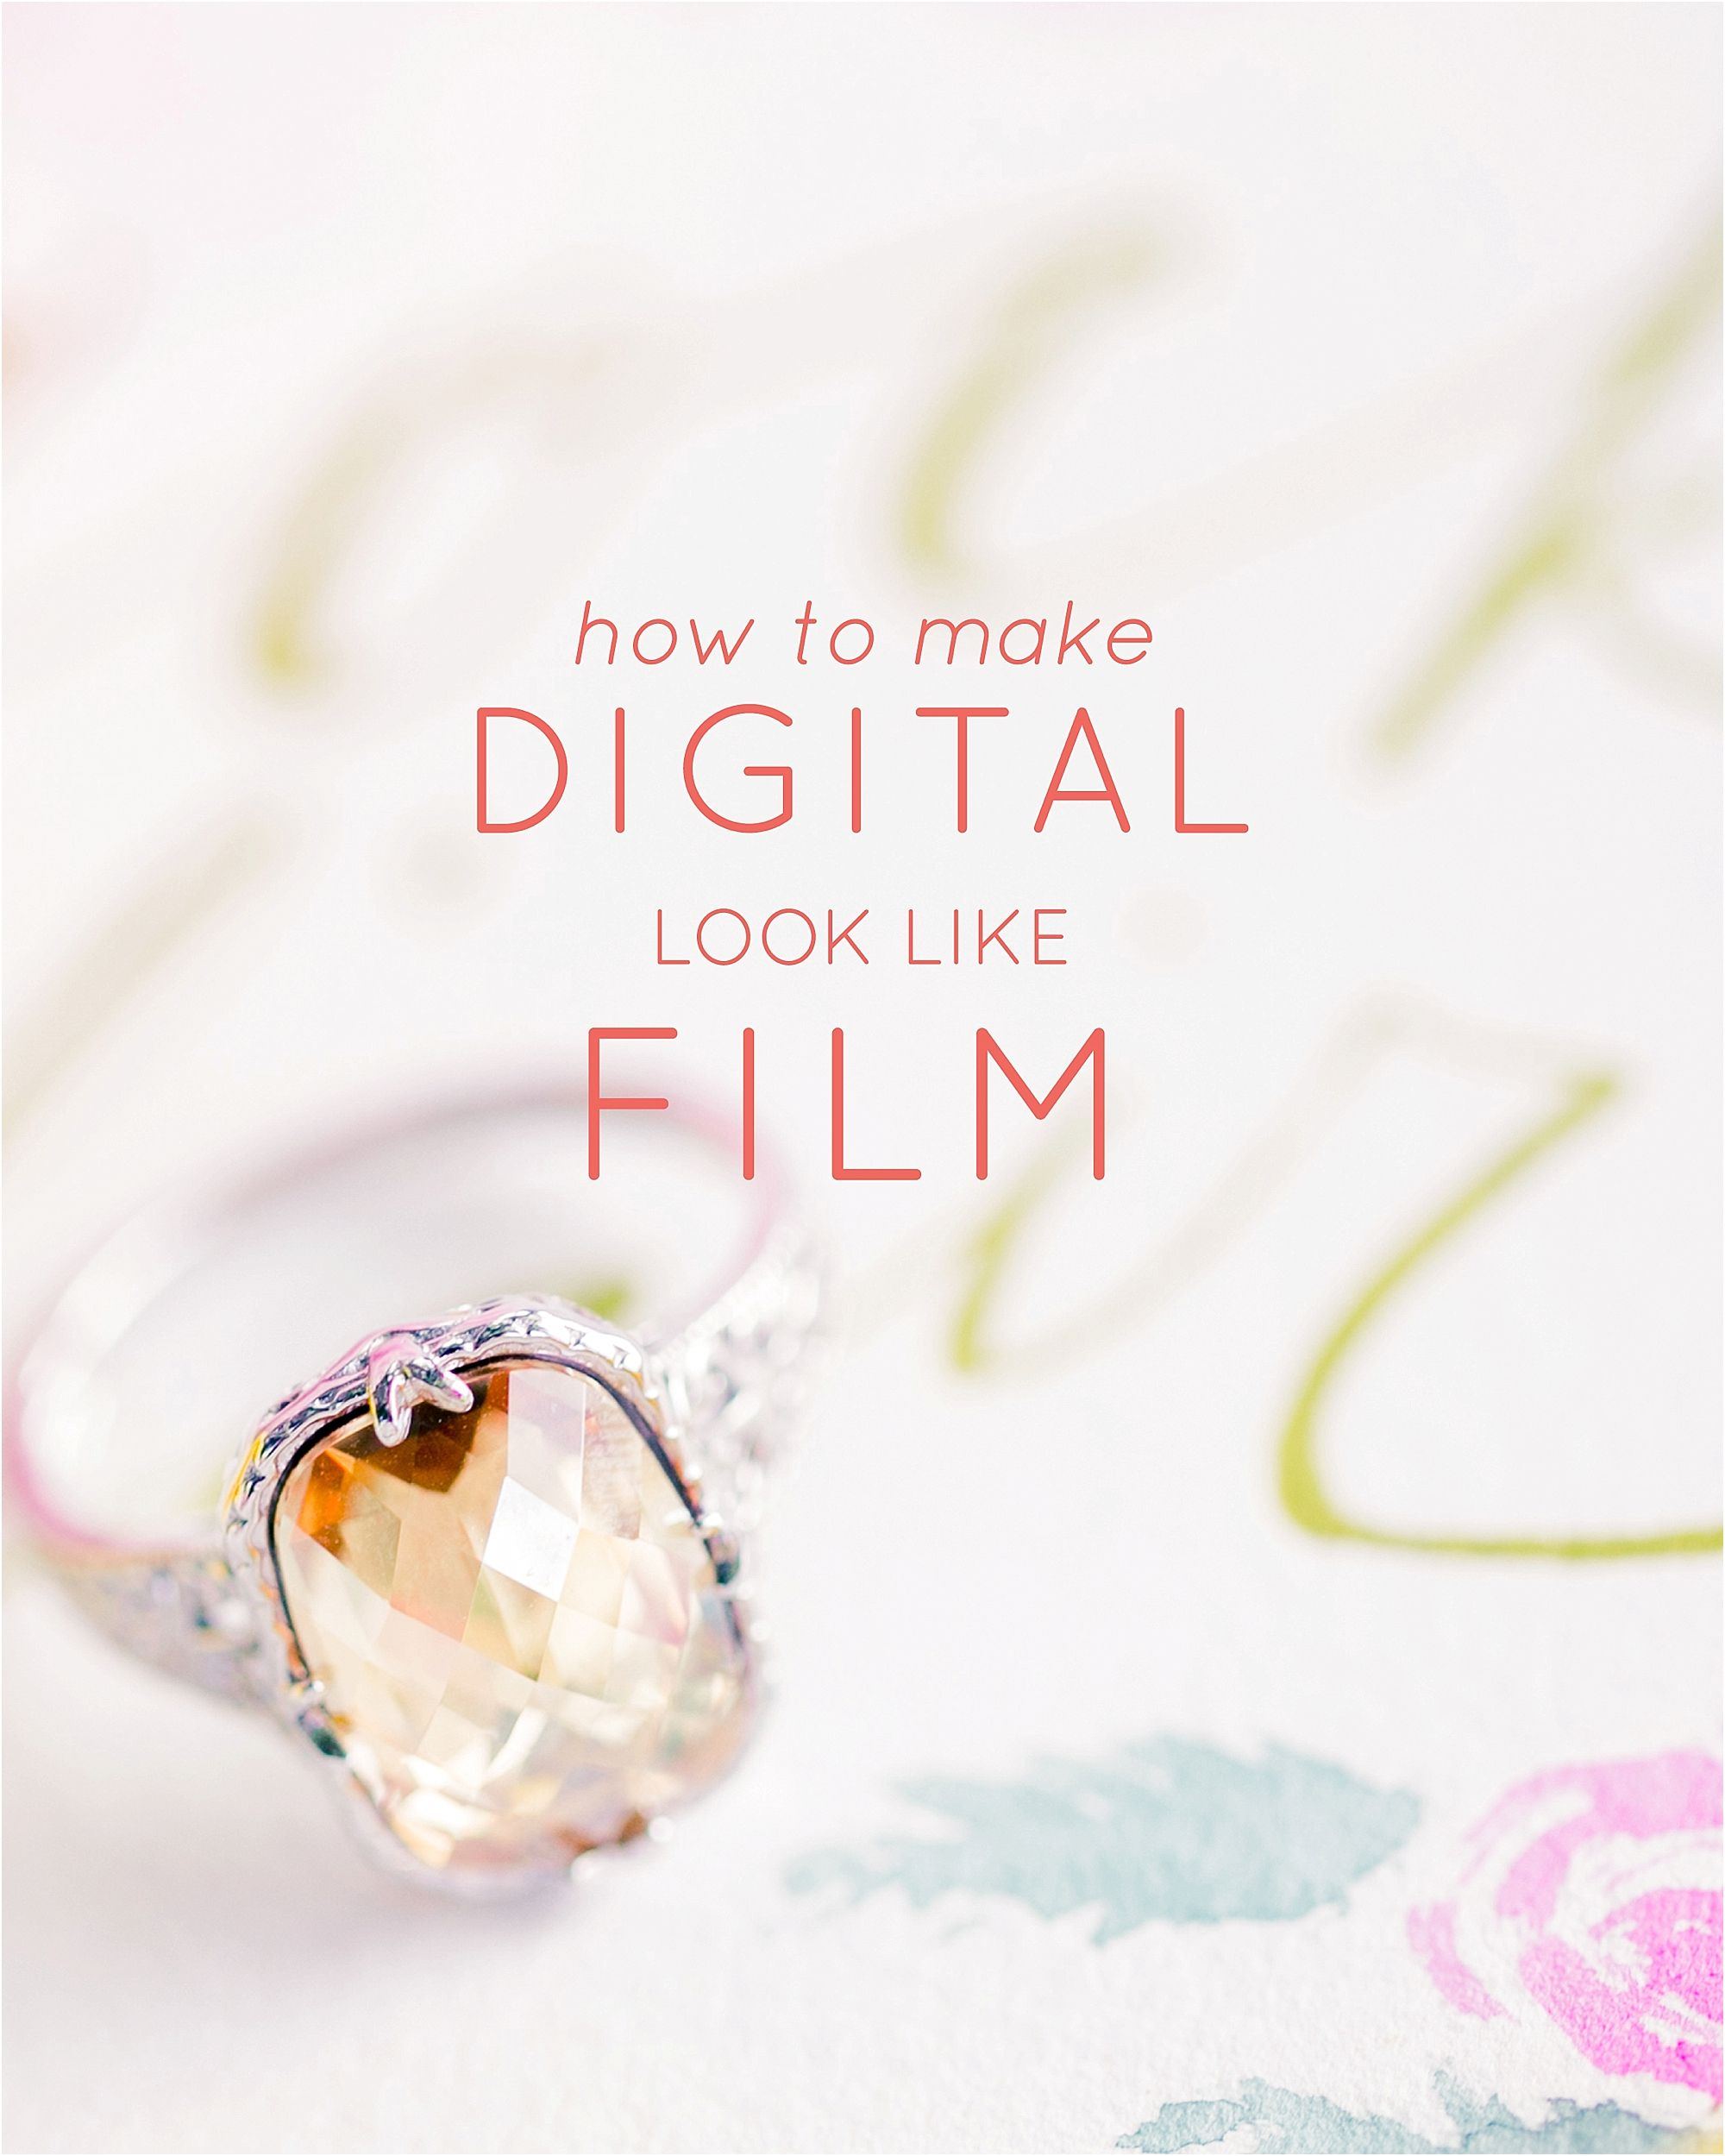 How to make digital look like film